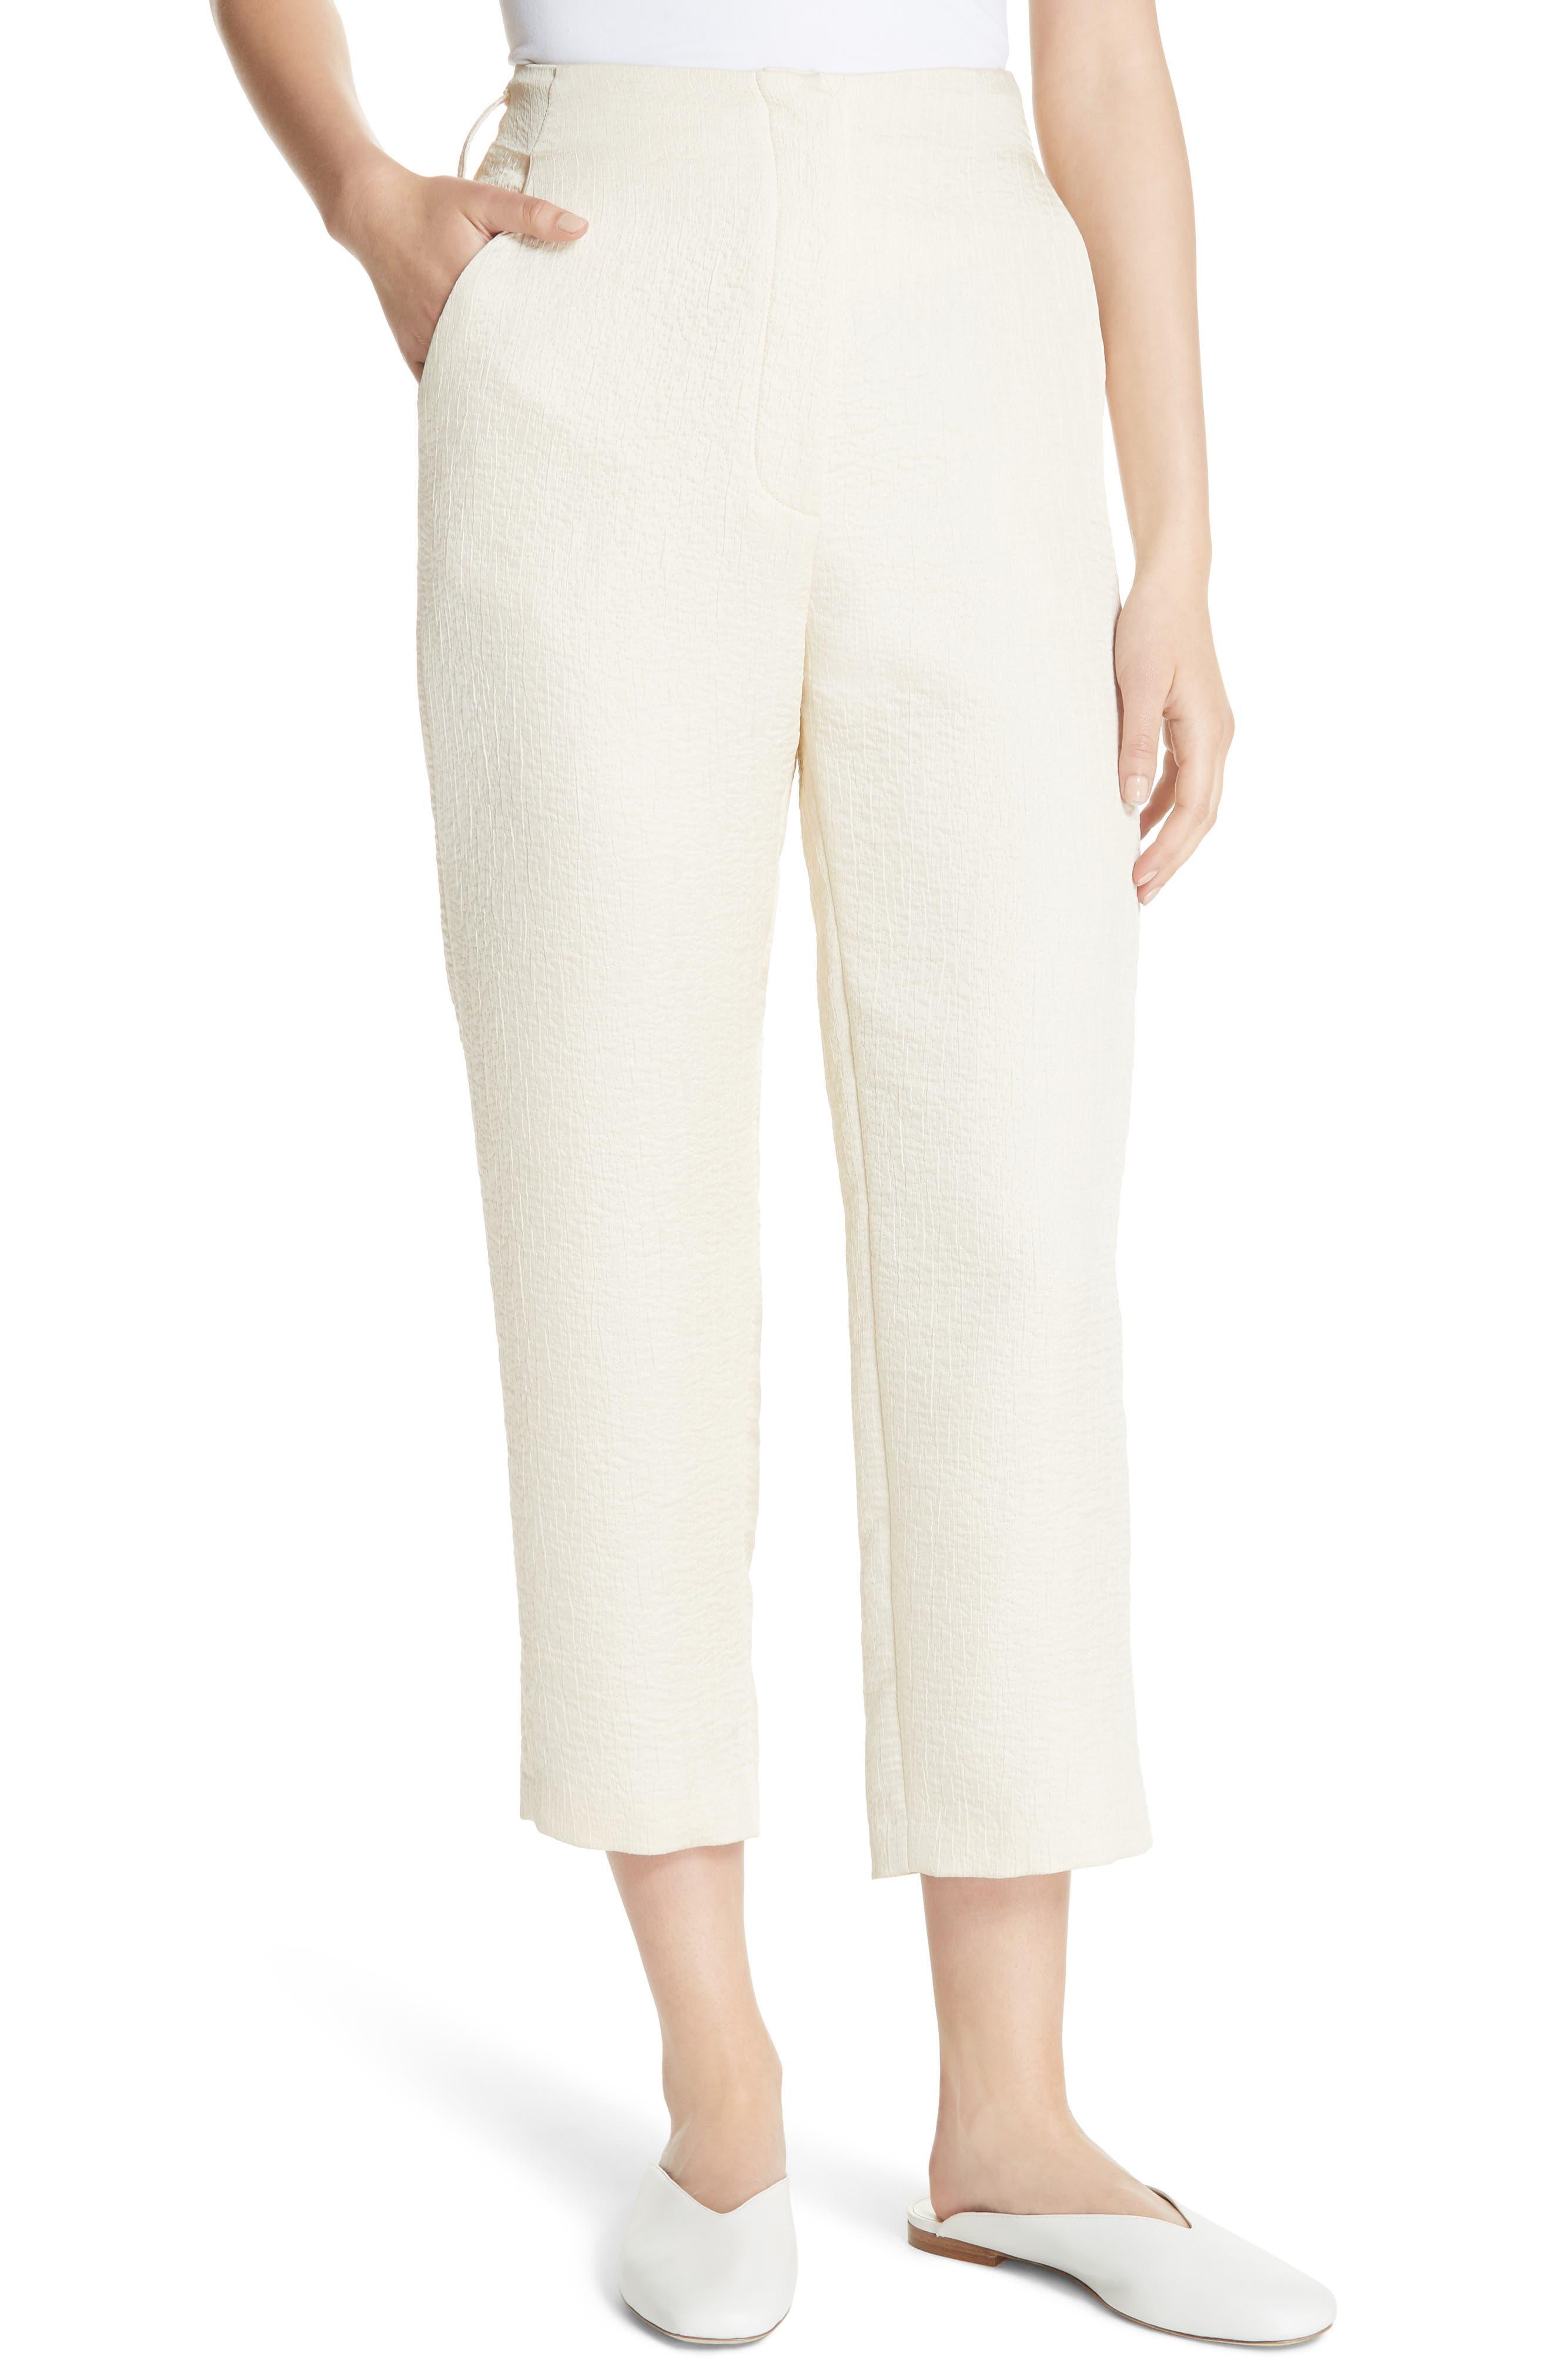 Raimo Belt Bag Crop Pants,                             Alternate thumbnail 4, color,                             CREME